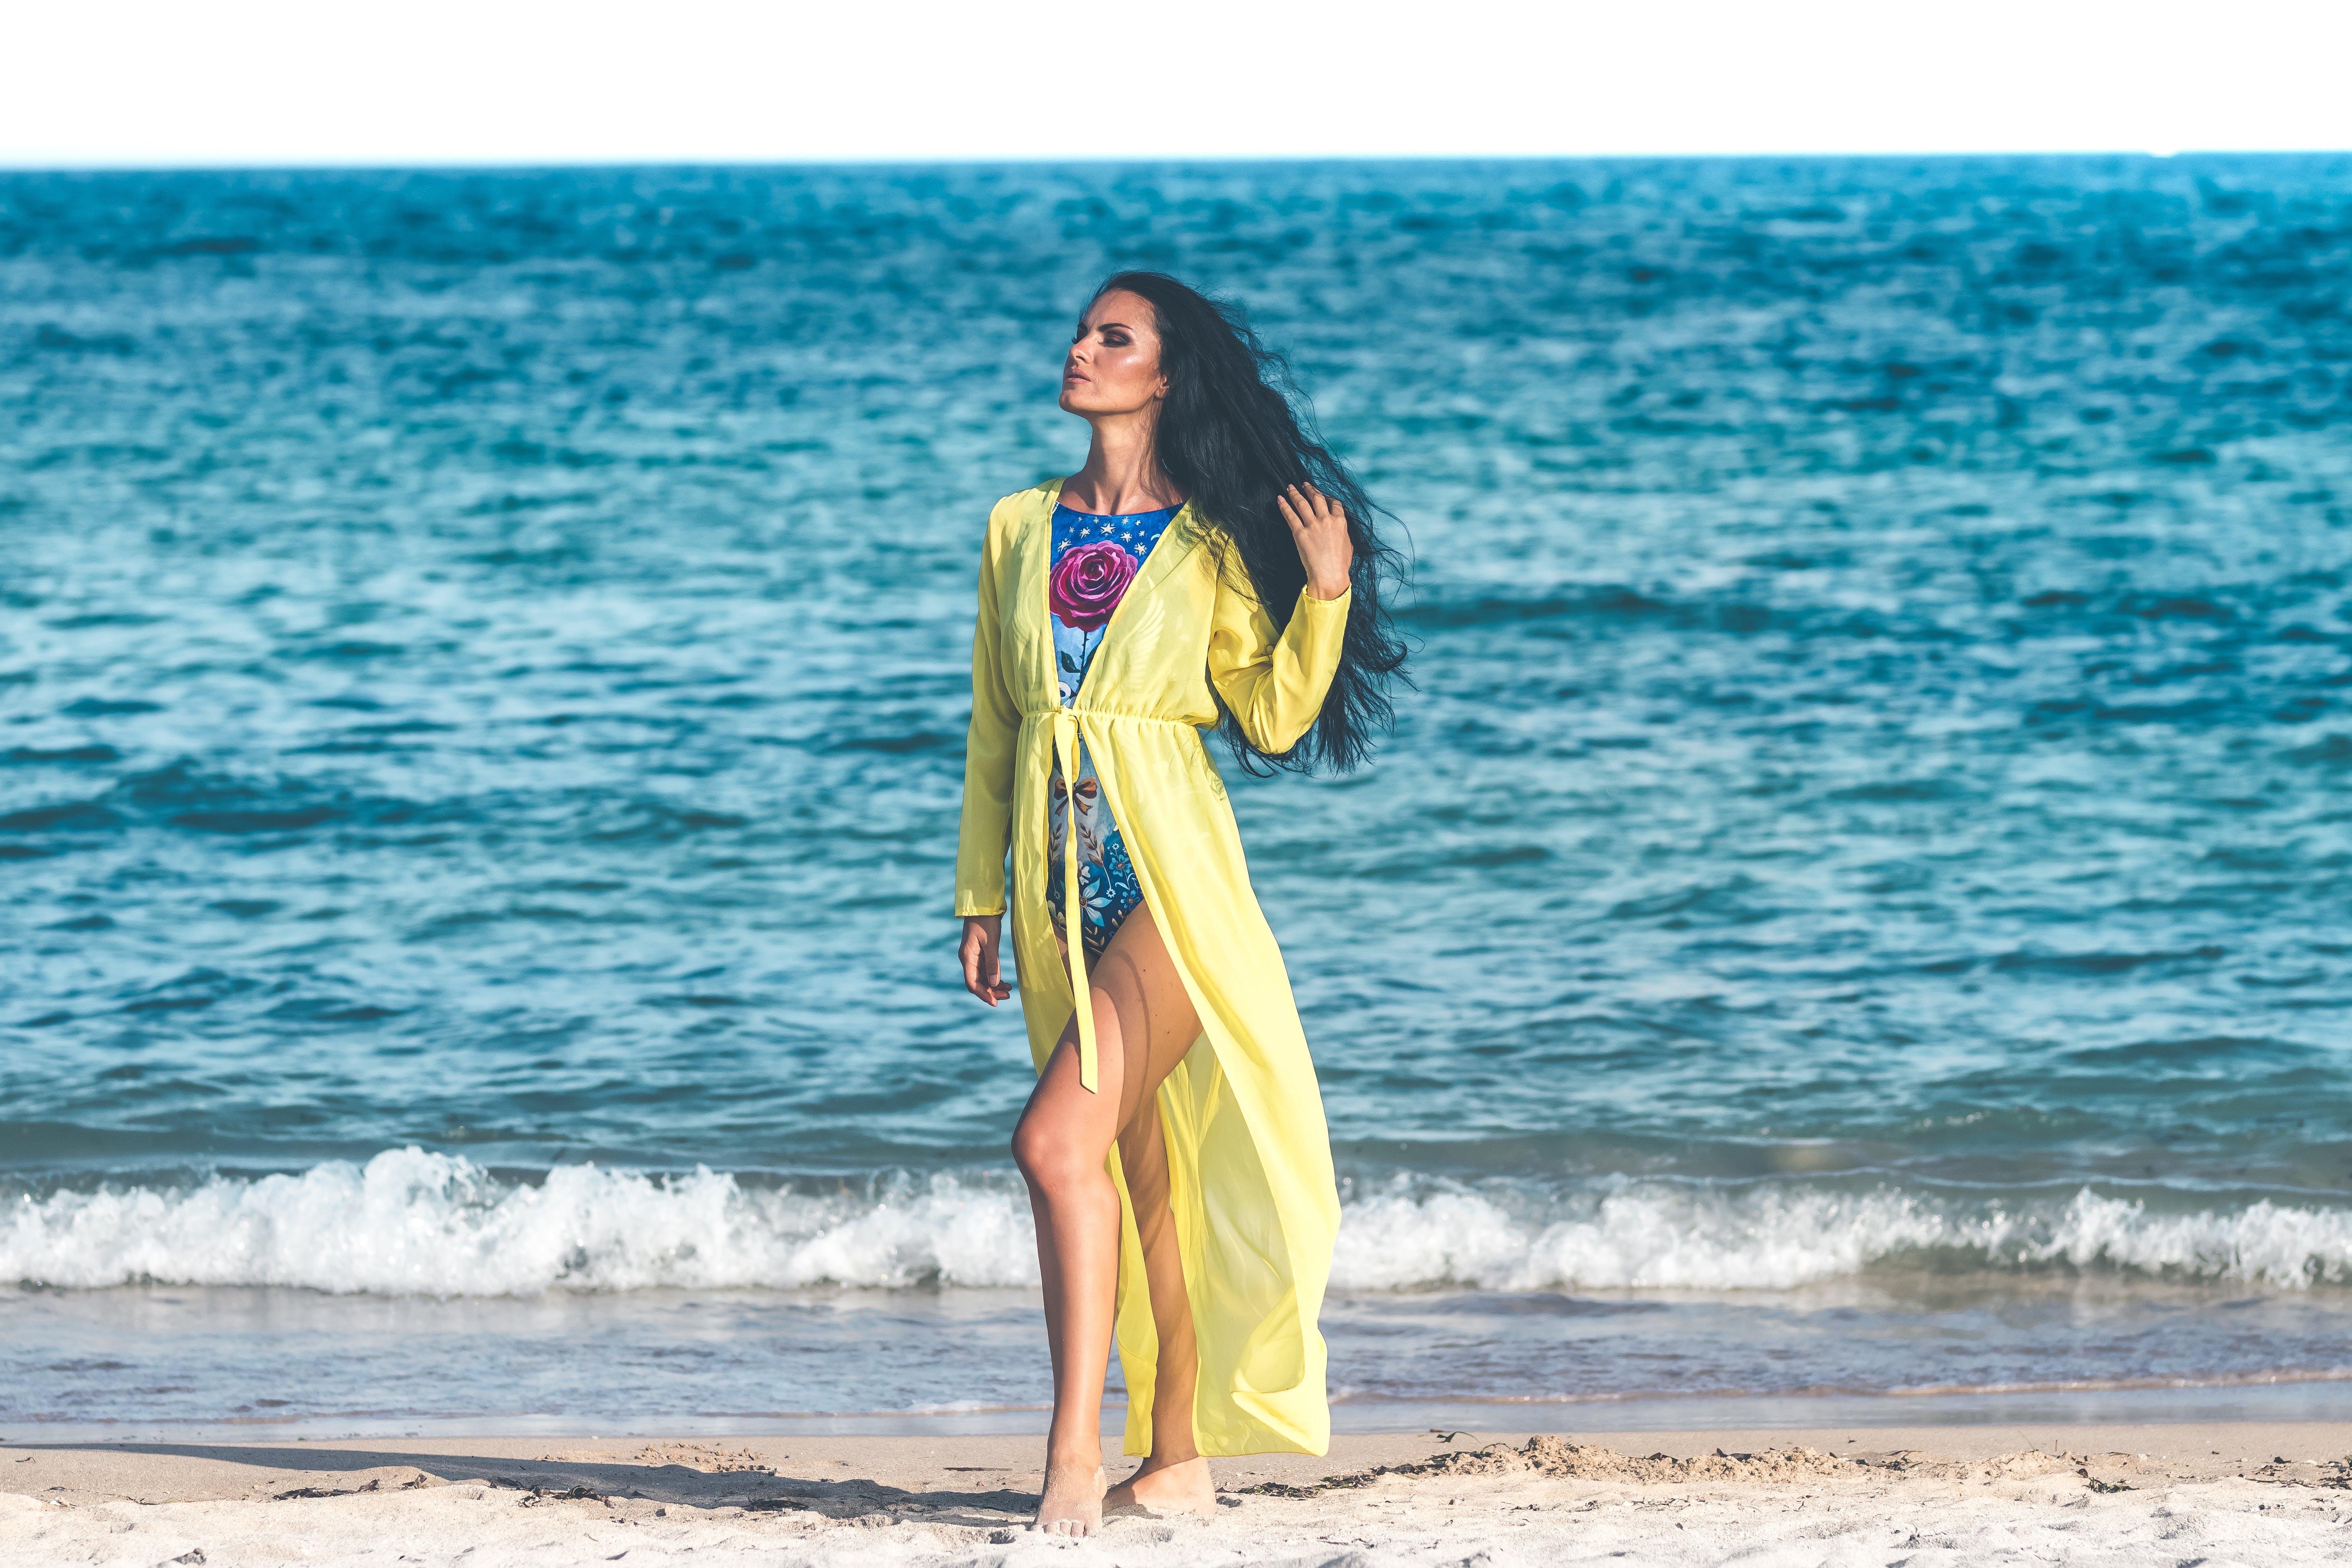 Woman Wearing Blue Monokini Standing on Beach Sand